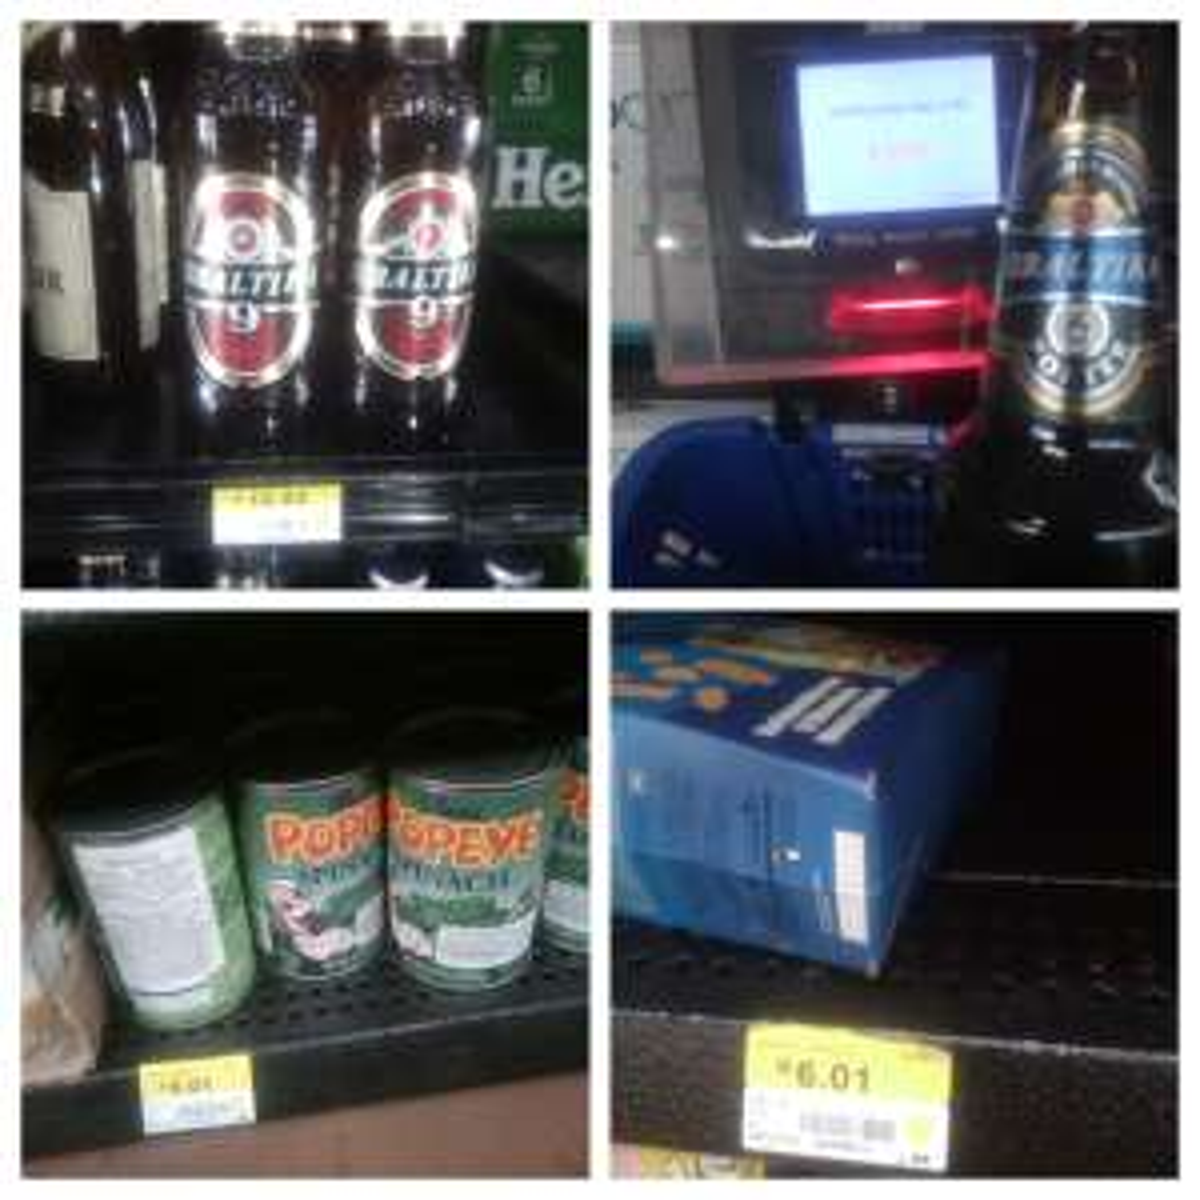 WALMART : Cerveza Baltika Porter y Lager